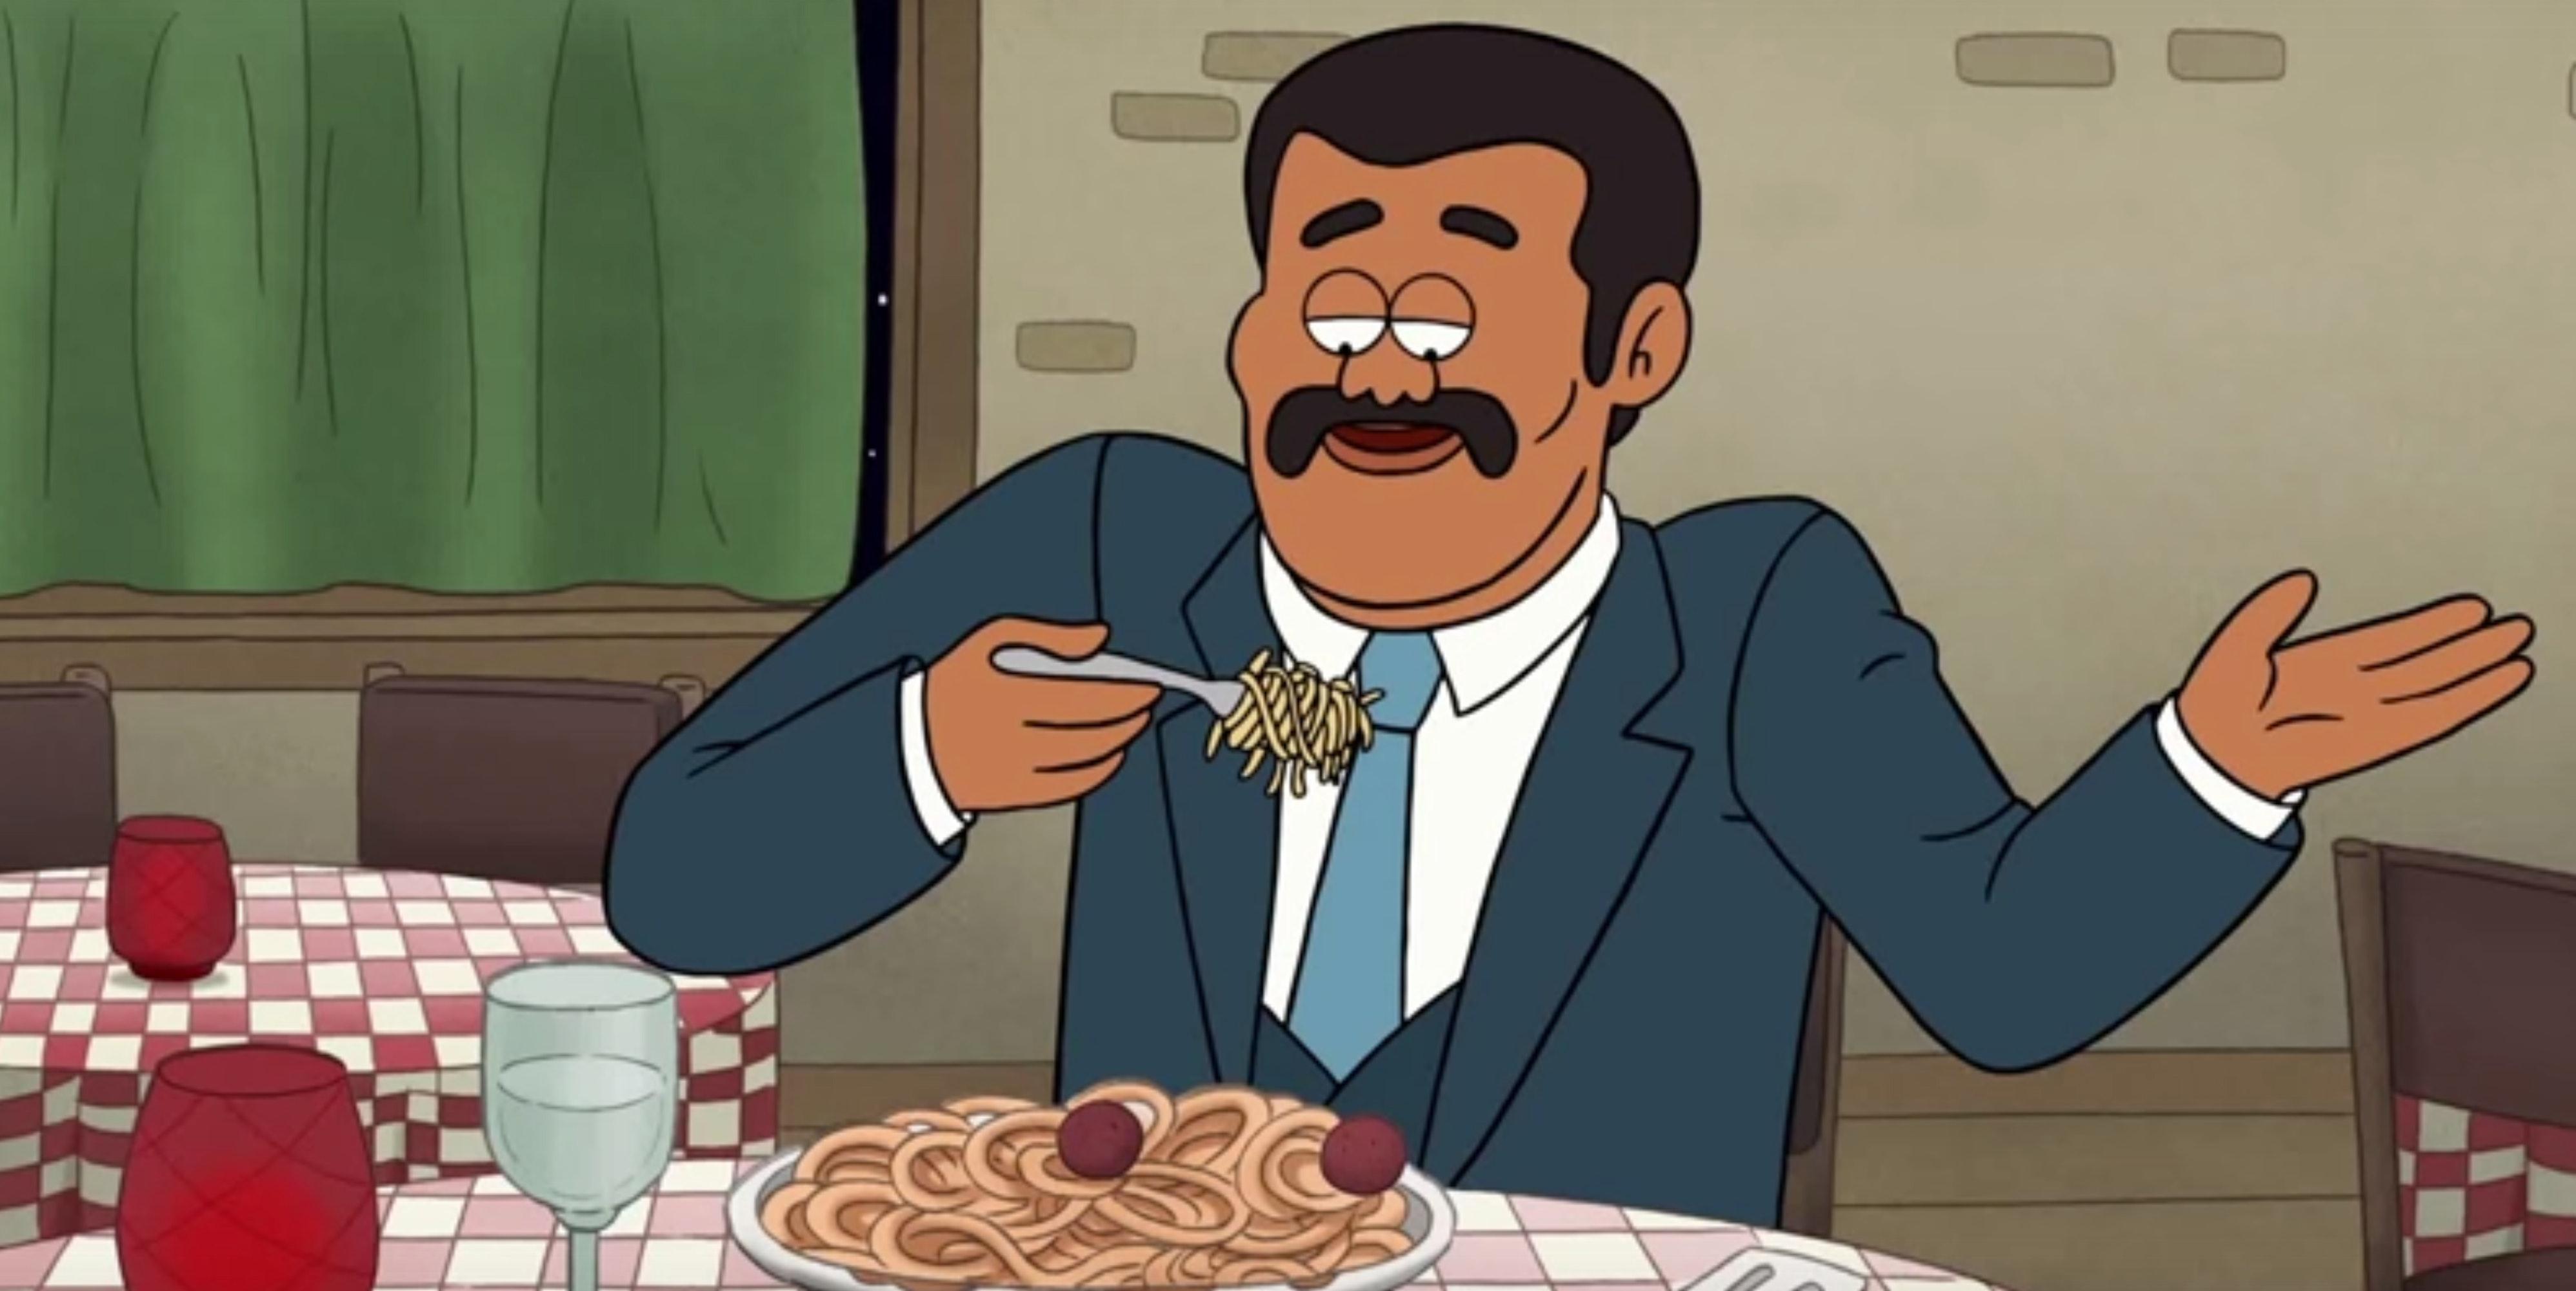 Neil deGrasse Tyson eats a scientific dinner.